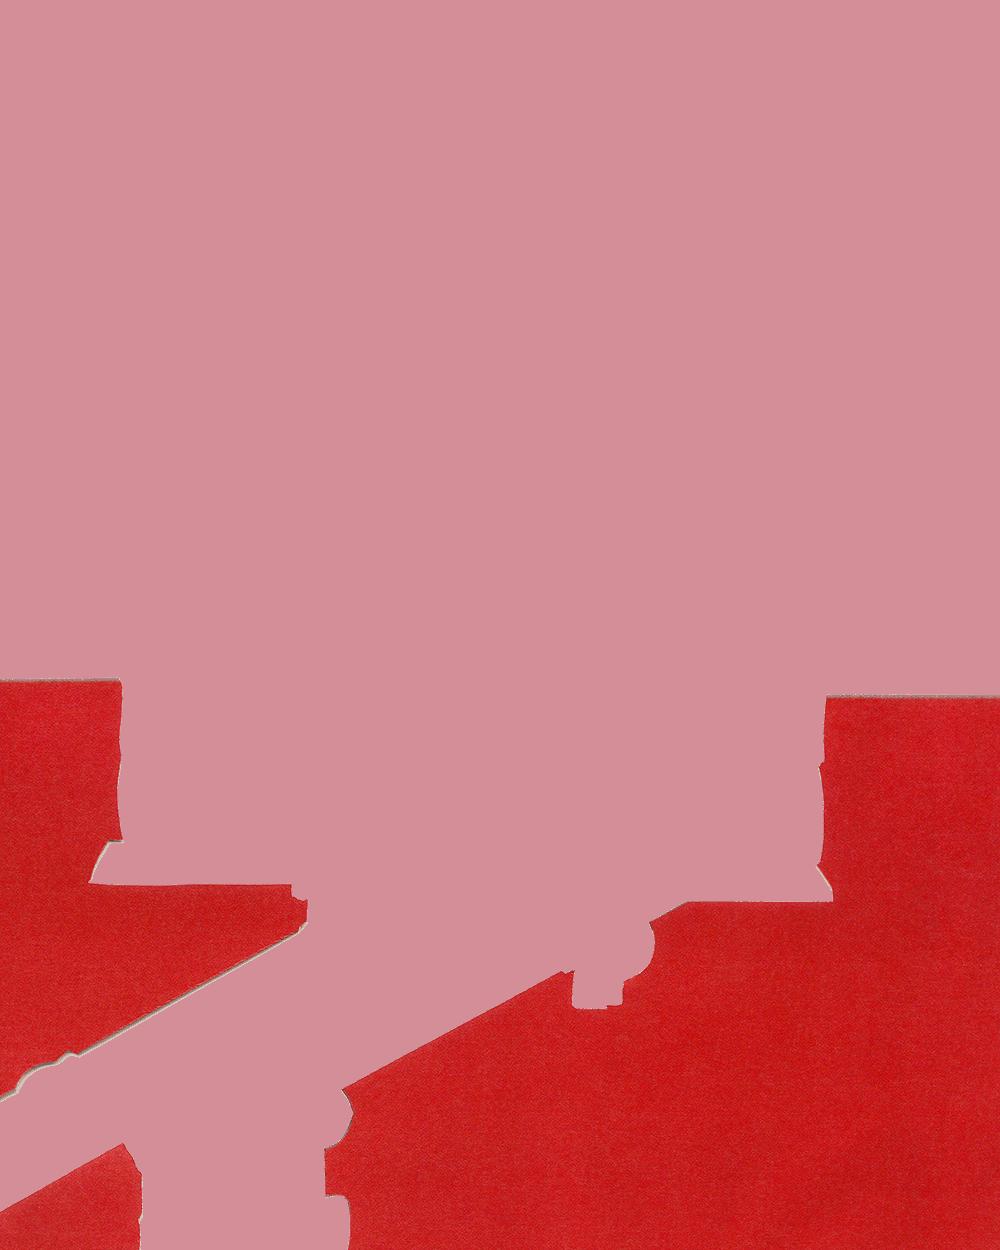 Eastpak-03-strictuakopie